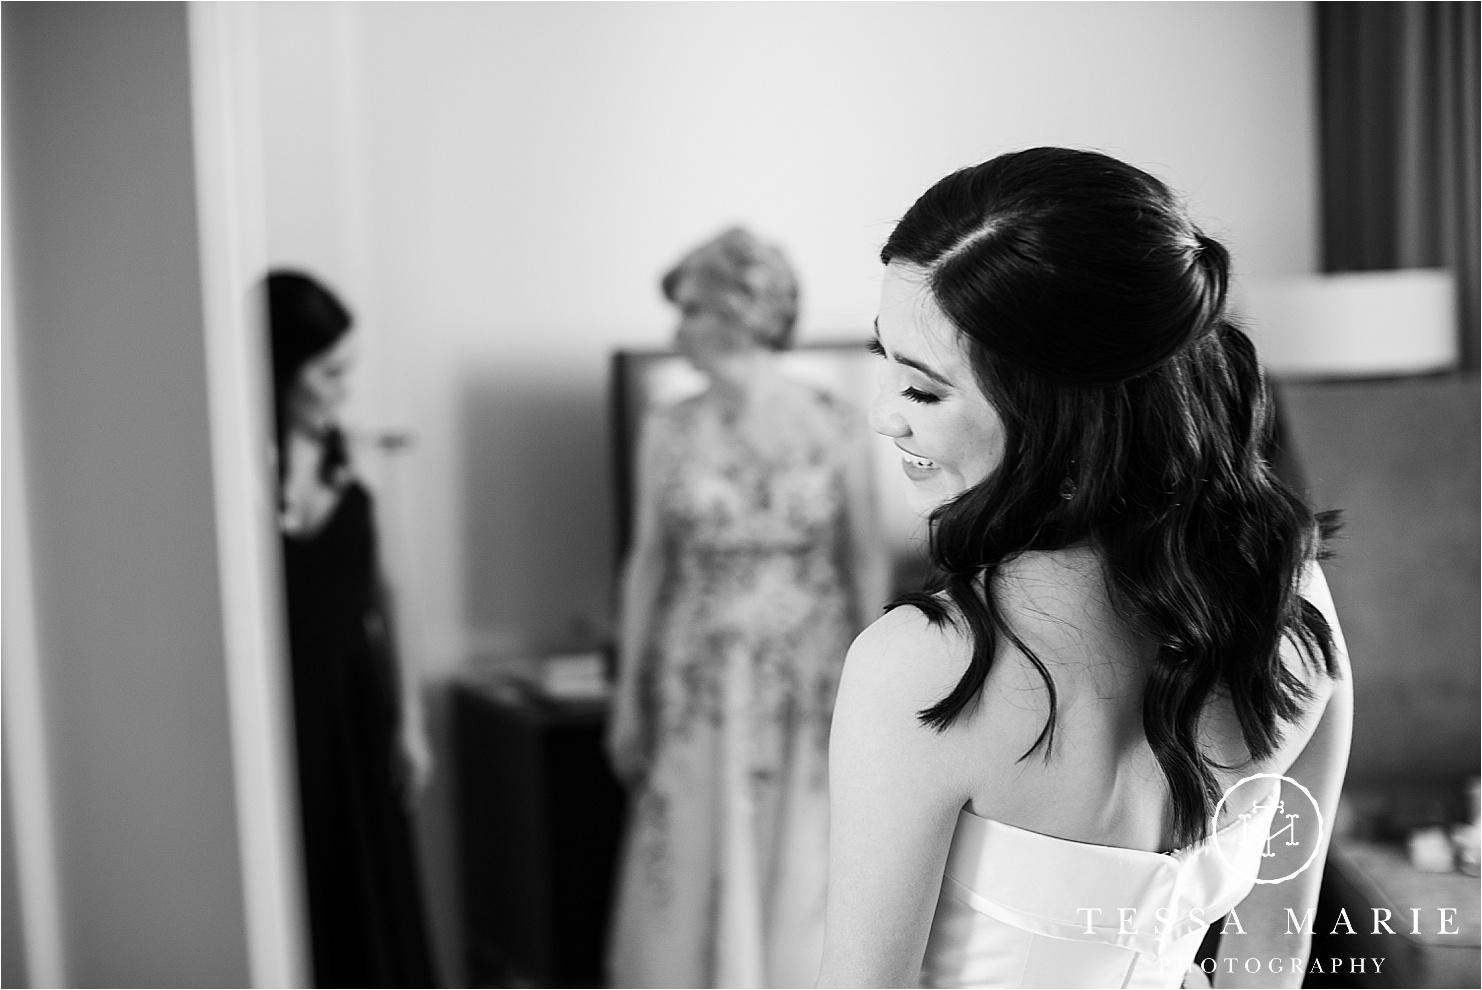 Tessa_marie_weddings_houston_wedding_photographer_The_astorian_0023.jpg